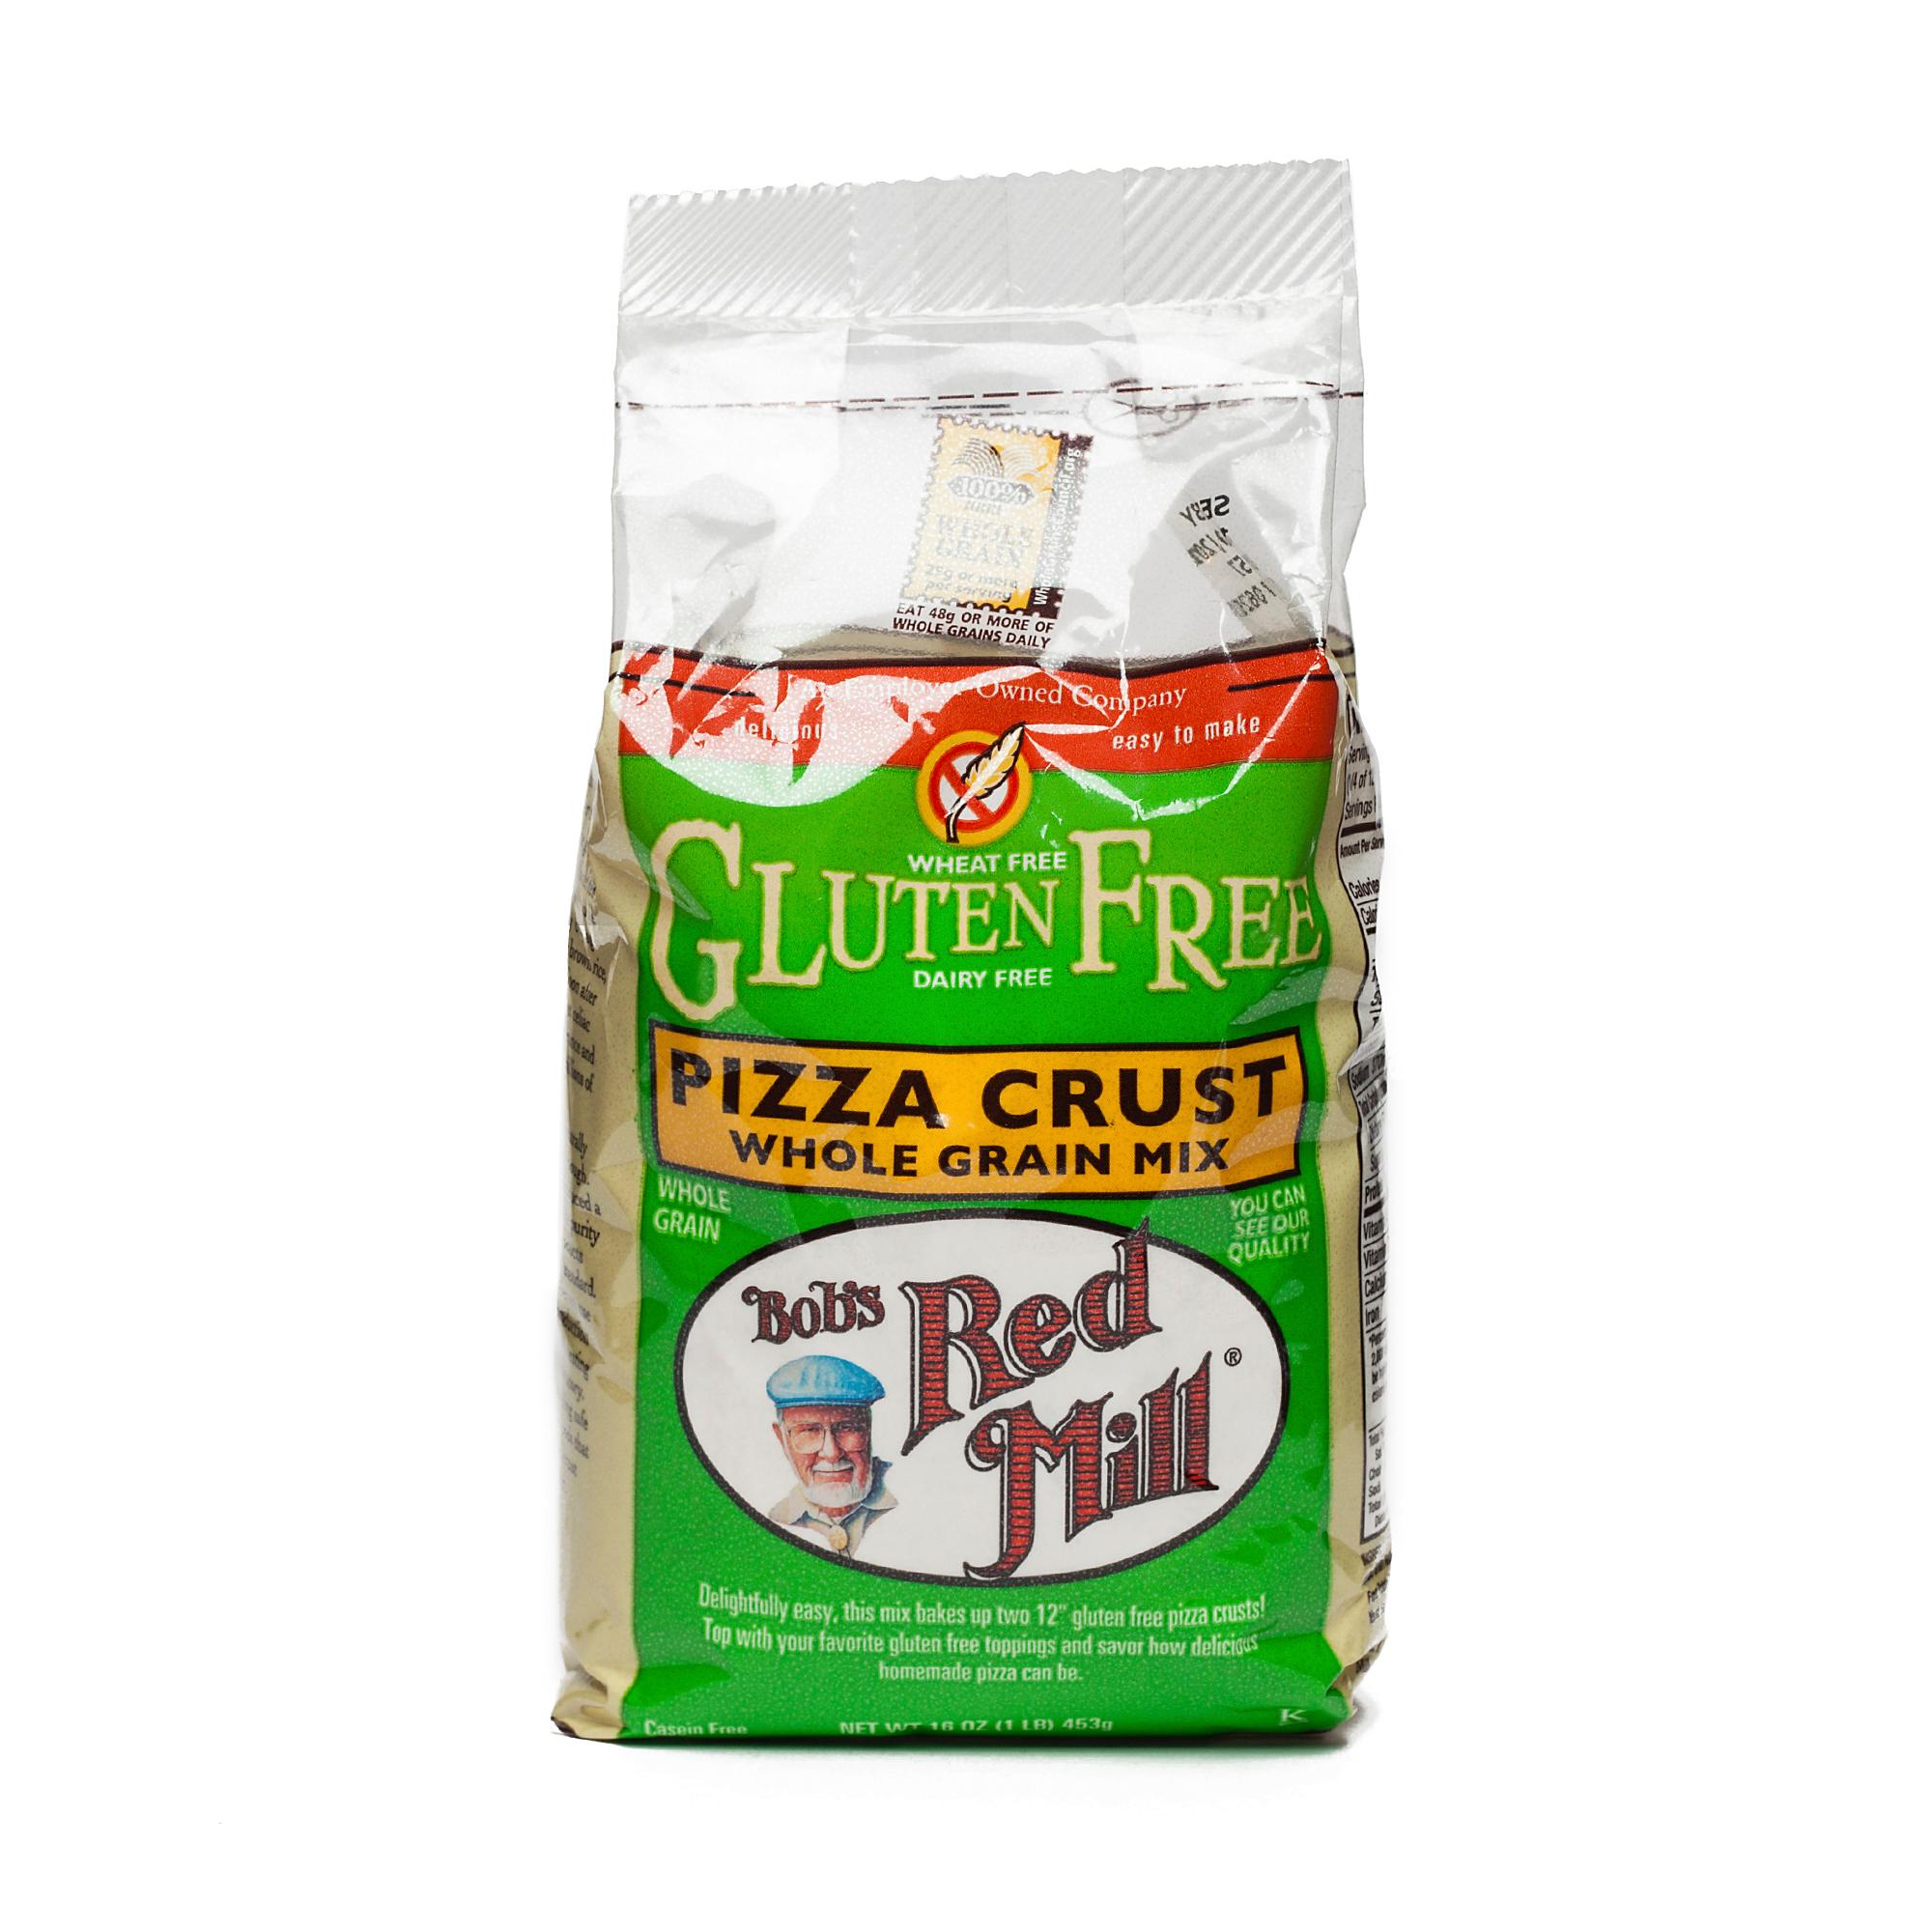 Image of Bob's Red Mill Gluten Free Pizza Crust Mix 16 oz bag